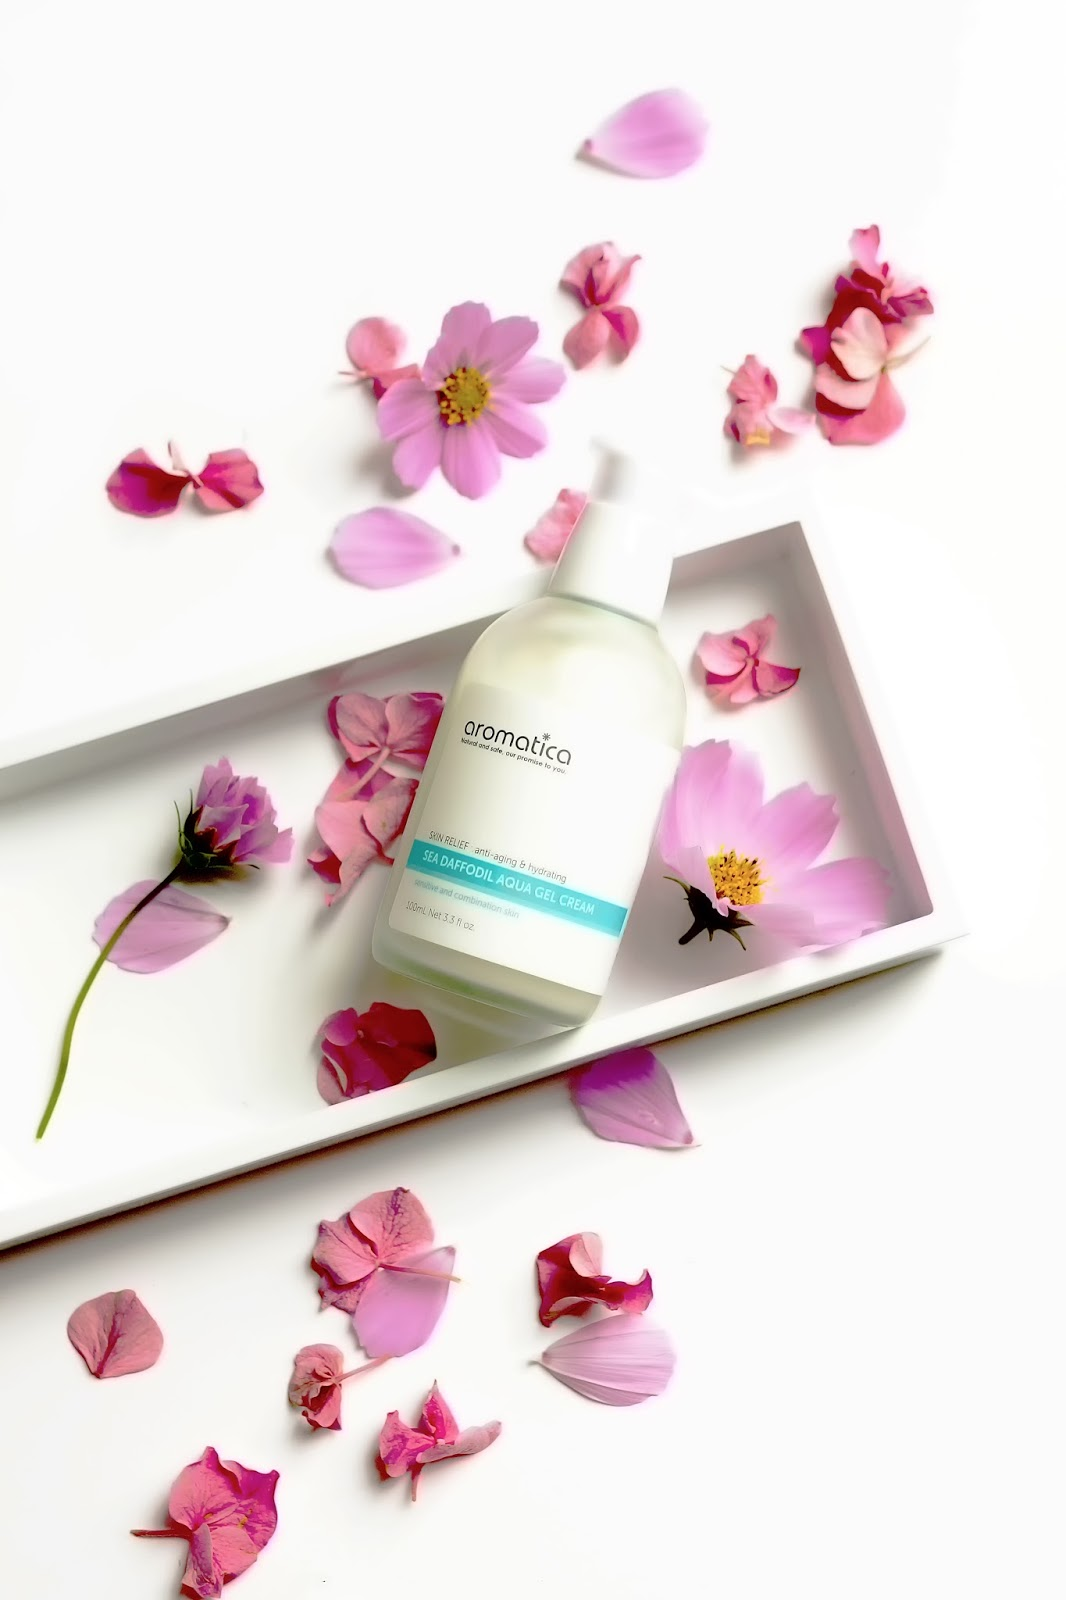 barely-there-beauty-blog-aromatica-sea-daffodil-aqua-gel-cream-review